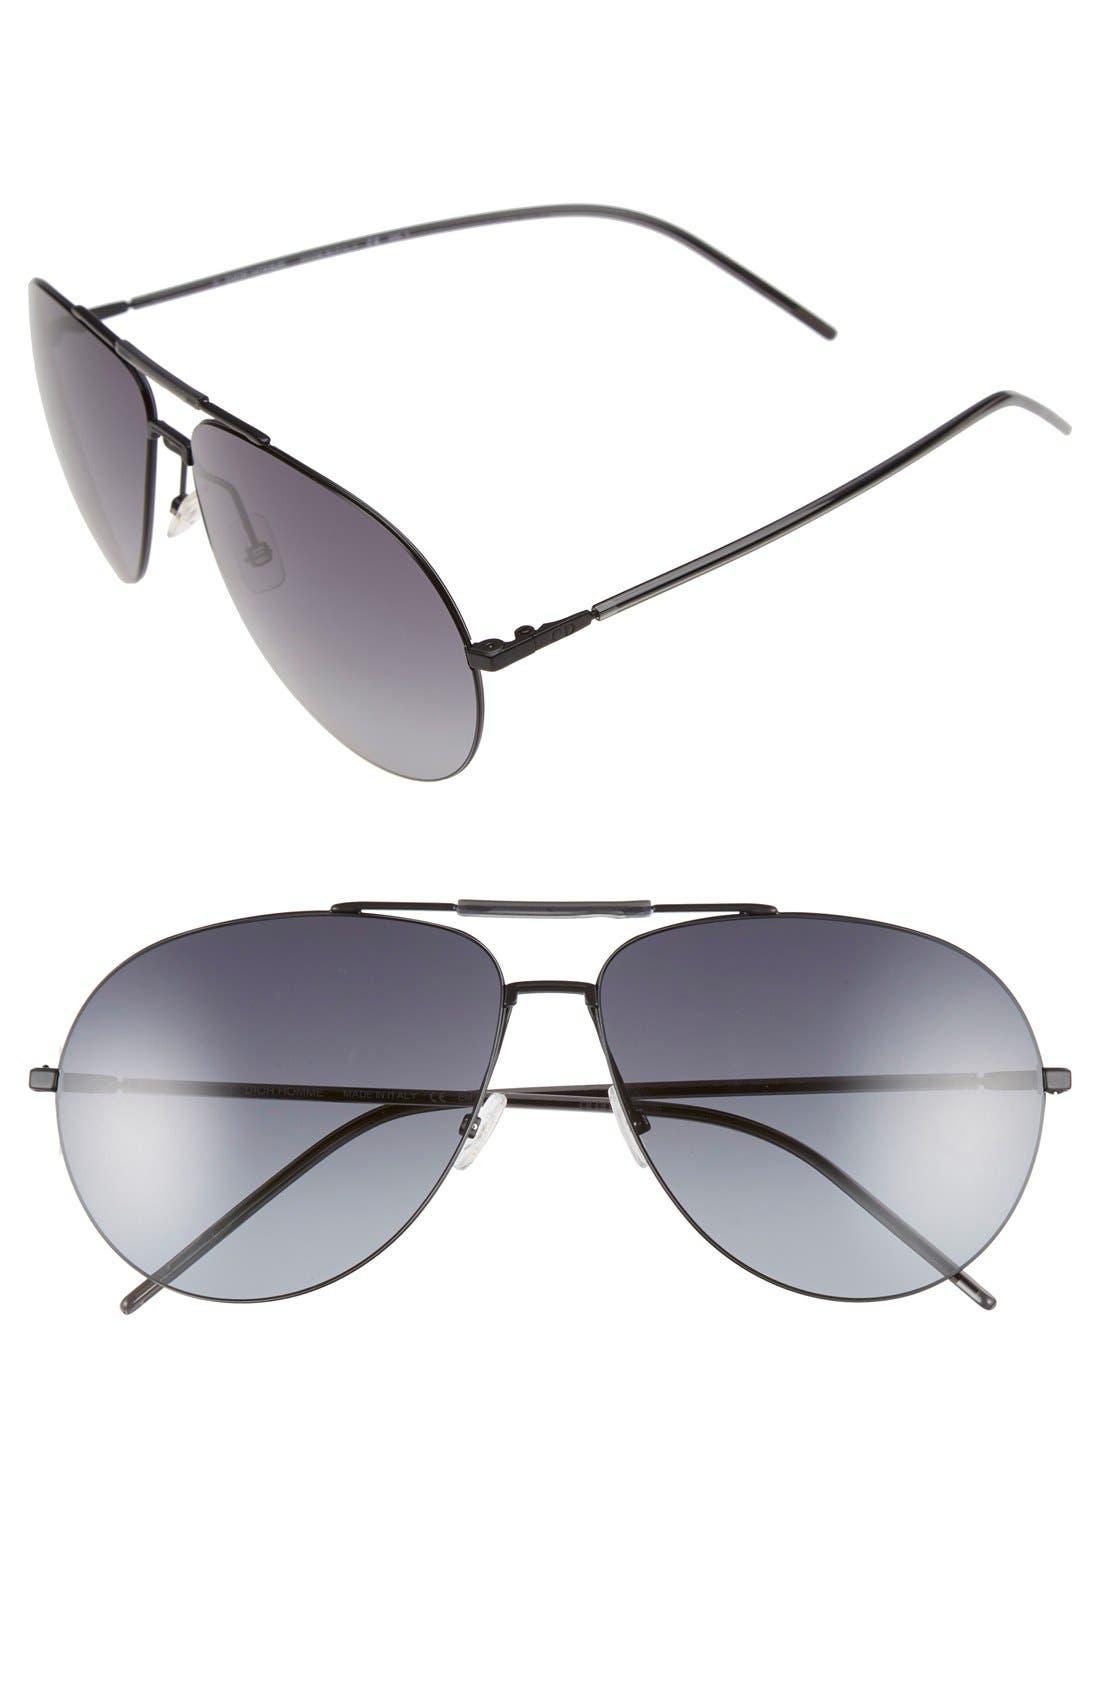 62mm Aviator Sunglasses,                         Main,                         color, 020